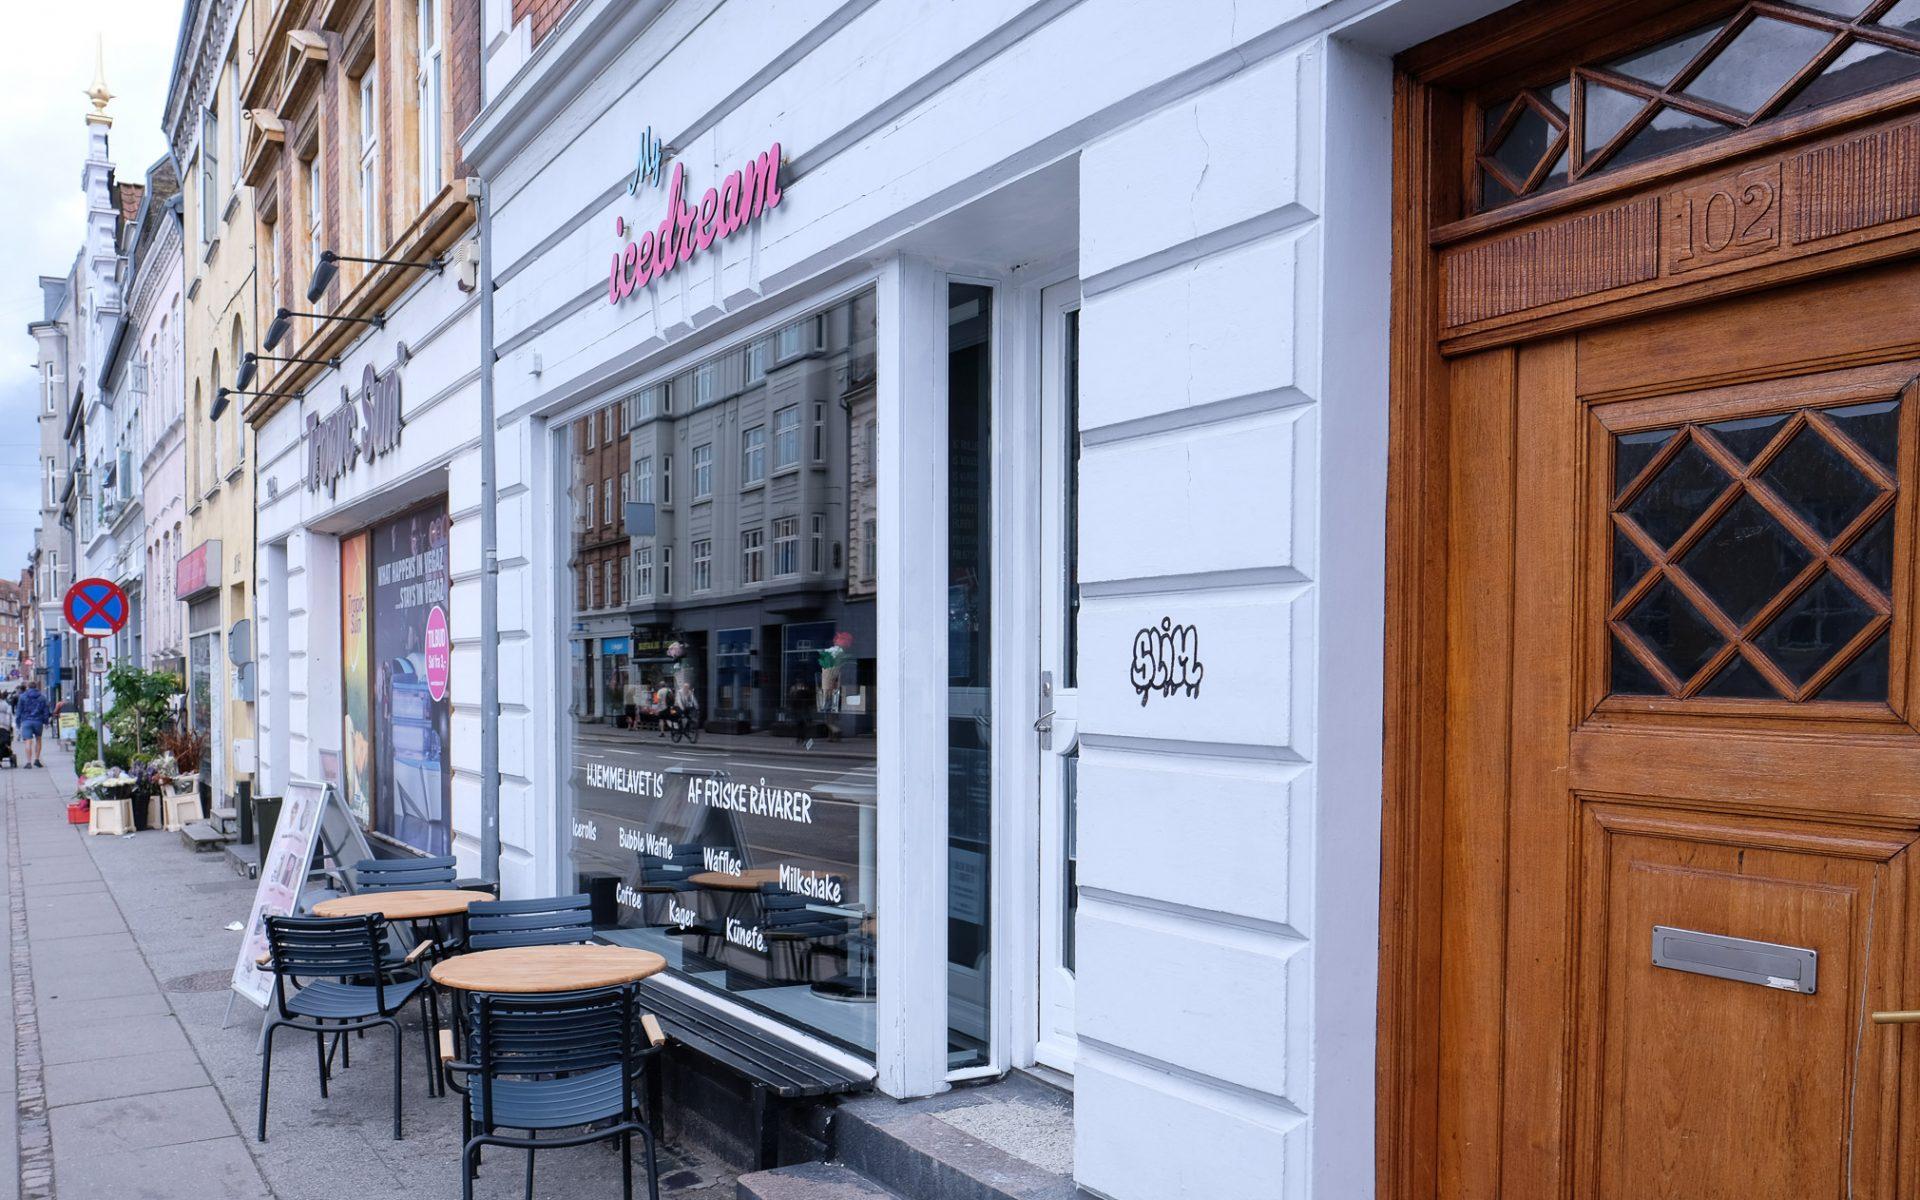 Ny arabisk isbutik på Frederiks Allé: Hjemmelavet is, som ikke er set i Aarhus før